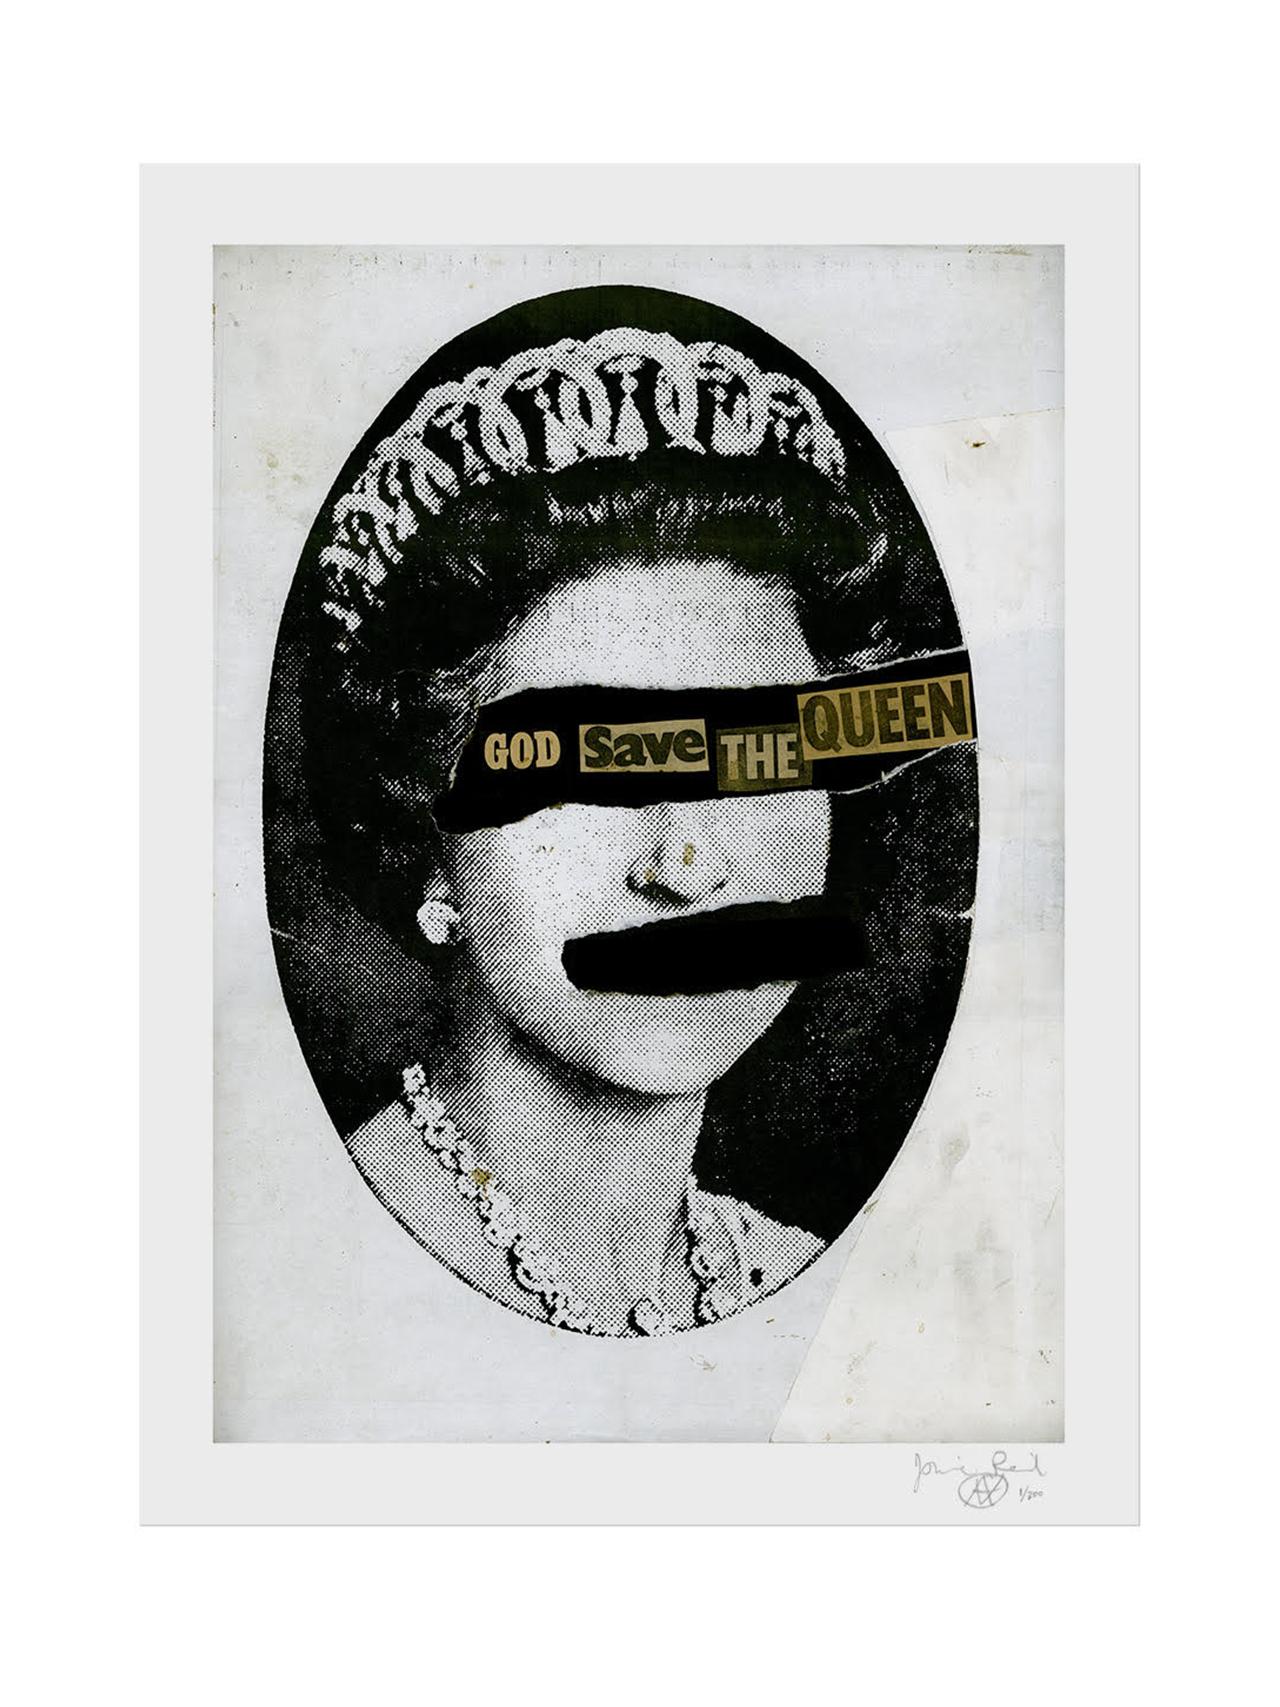 God Save The Queen Collage / Jamie Reid